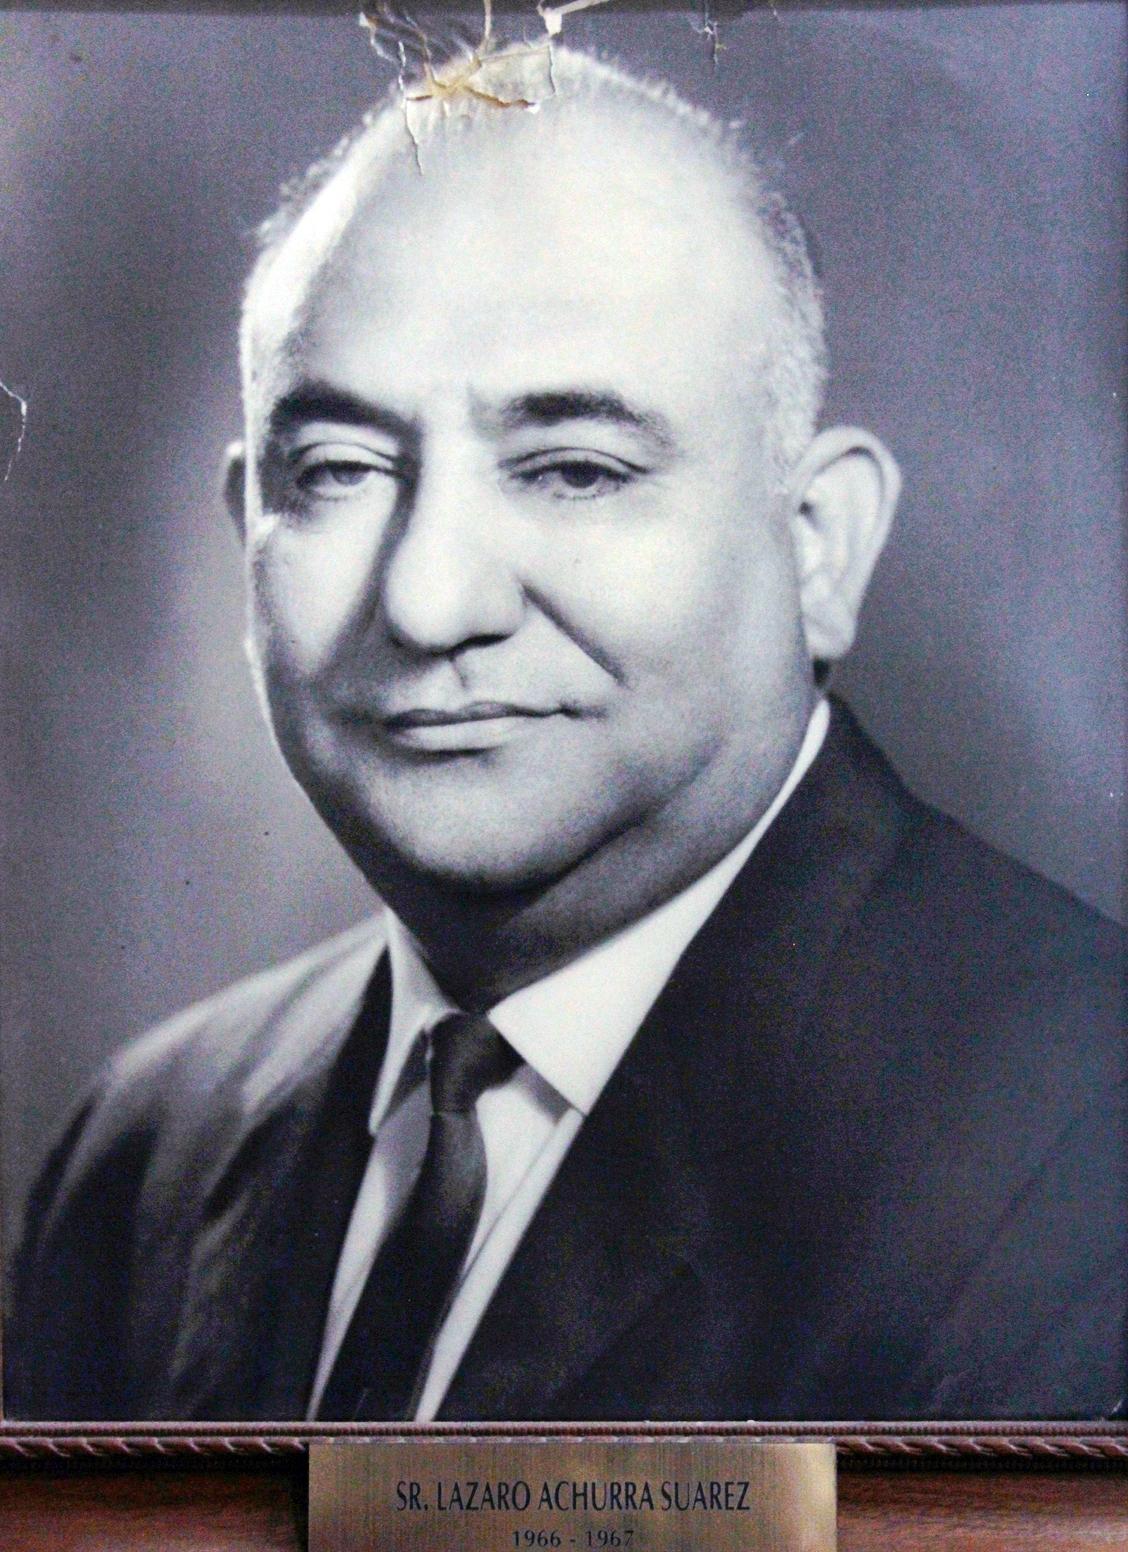 EMPRESARIO DISTINGUIDO SR. LAZARO ACHURRA SUAREZ